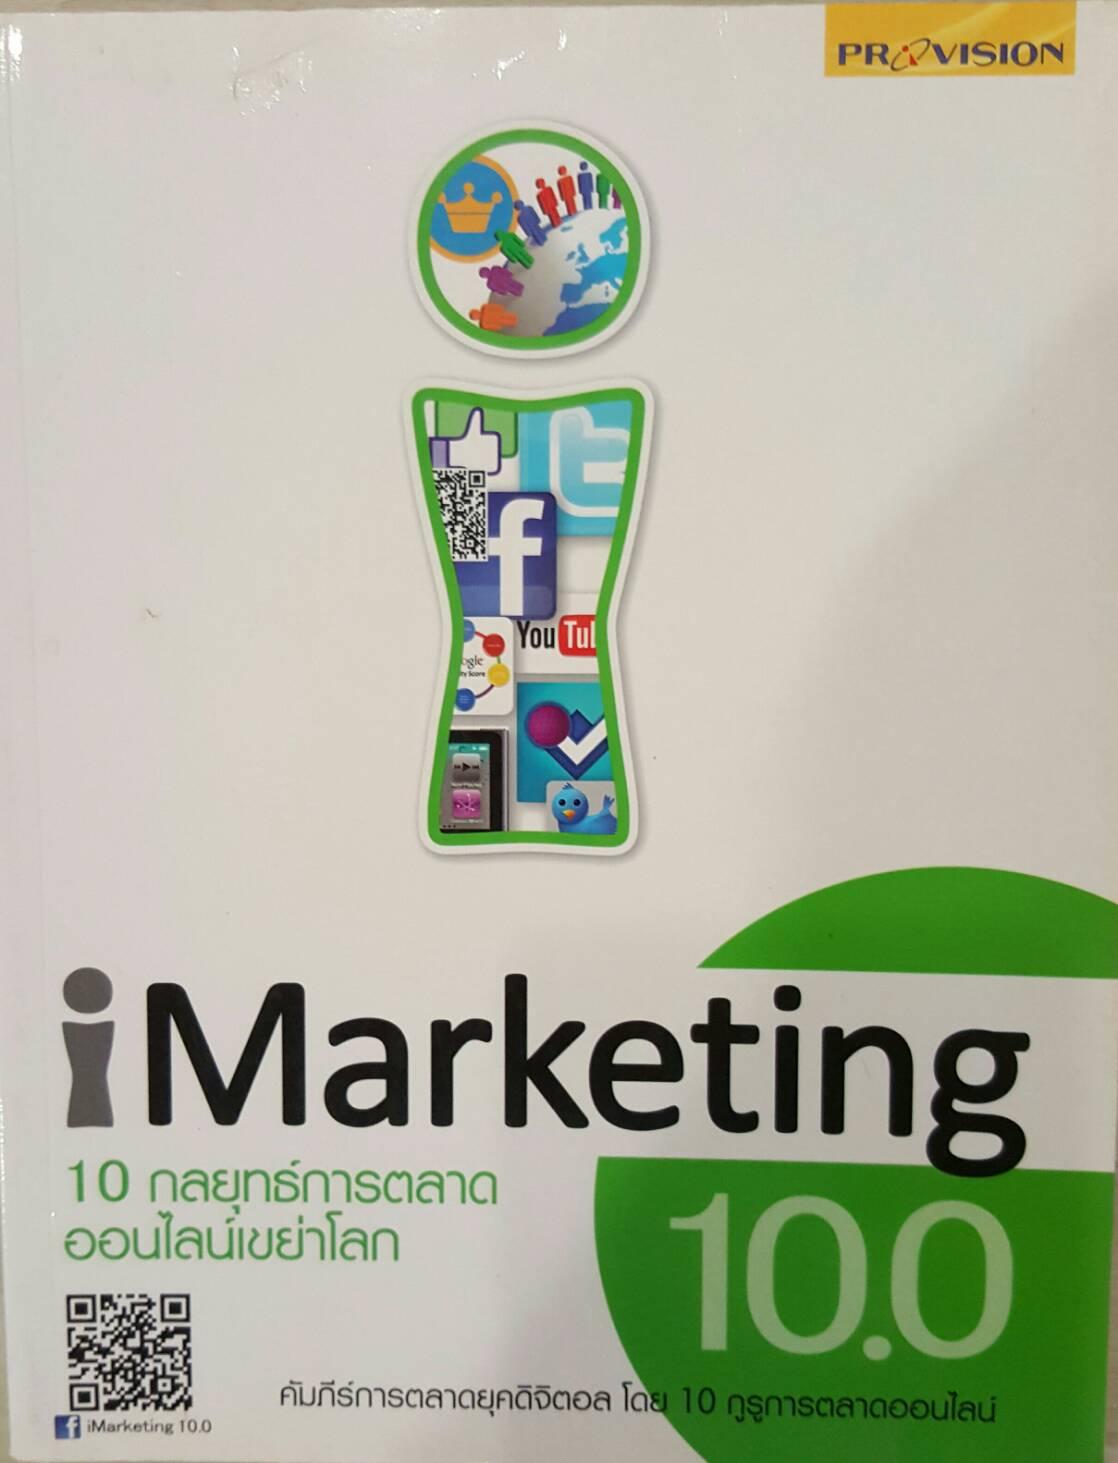 iMarketing 10กลยุทธ์การตลาดออนไลน์เขย่าโลก